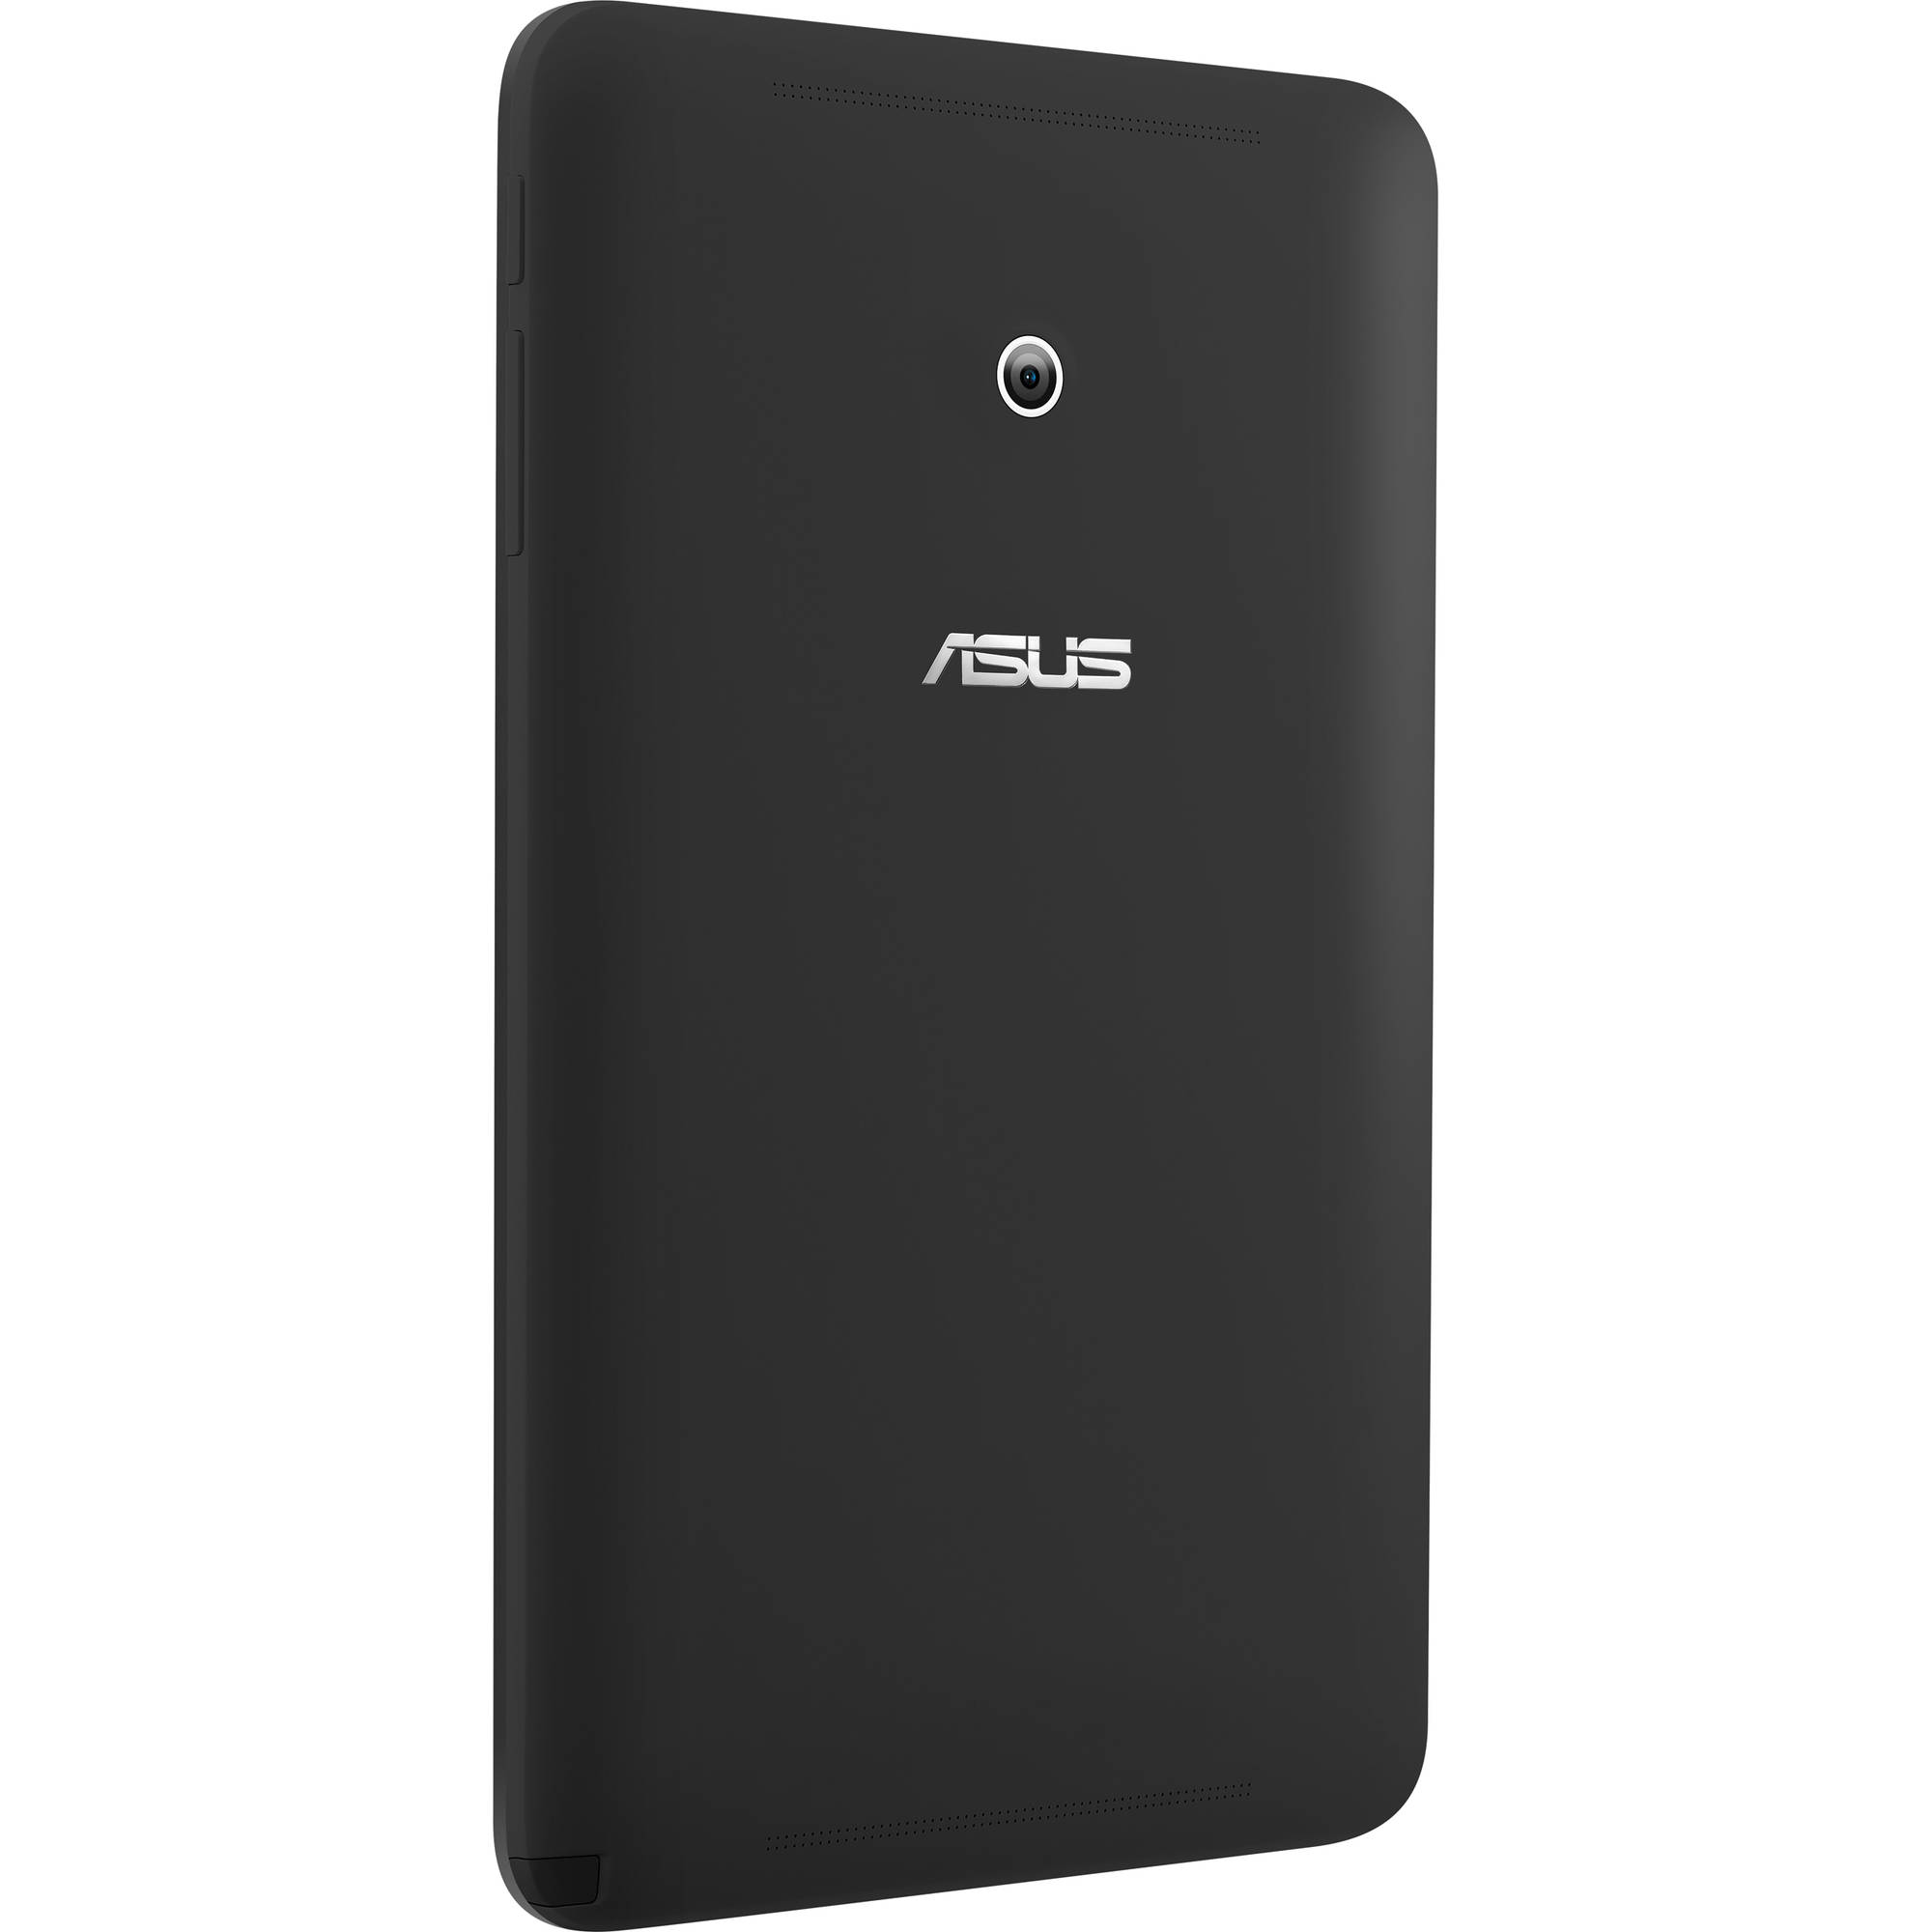 ASUS 32GB VivoTab Note 8 Multi-Touch 8